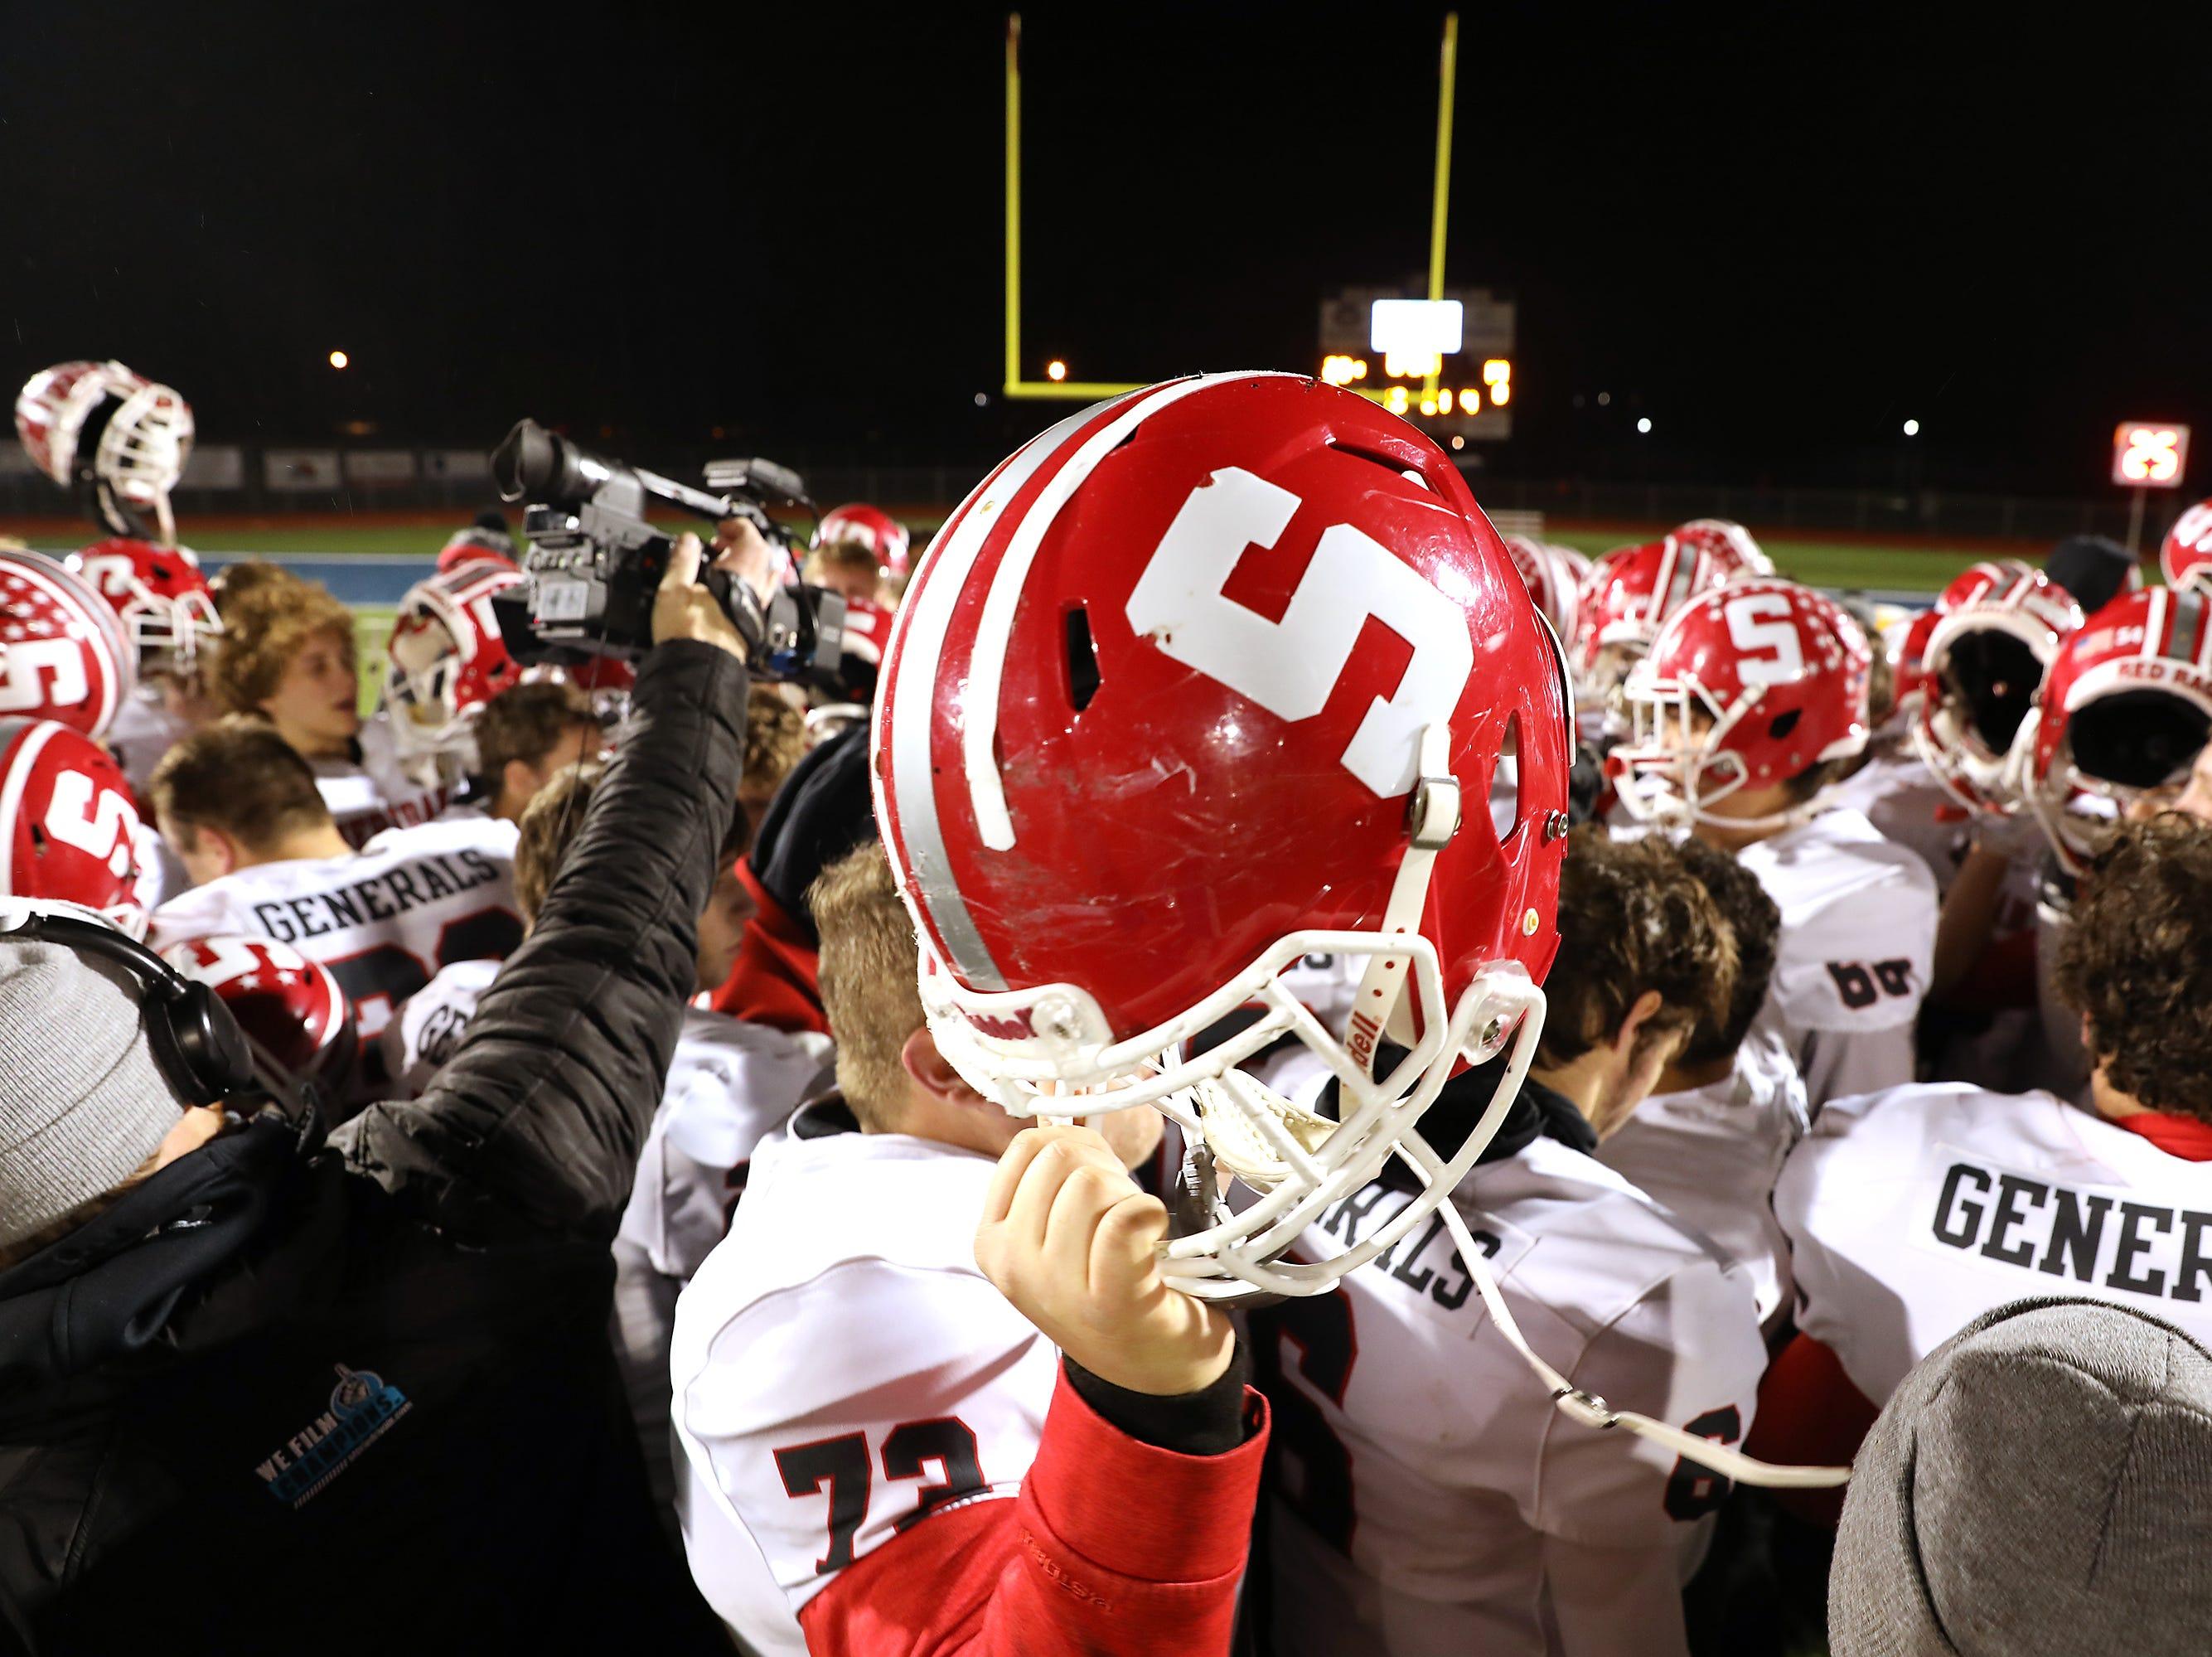 Sheridan raises their helmet one last time as their season draws to a close.